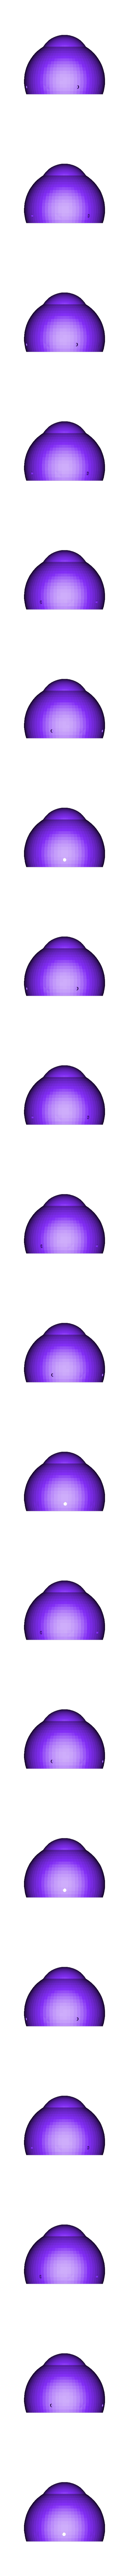 Eyeball.stl Download free STL file Animatronic eyes • 3D printer template, robolab19